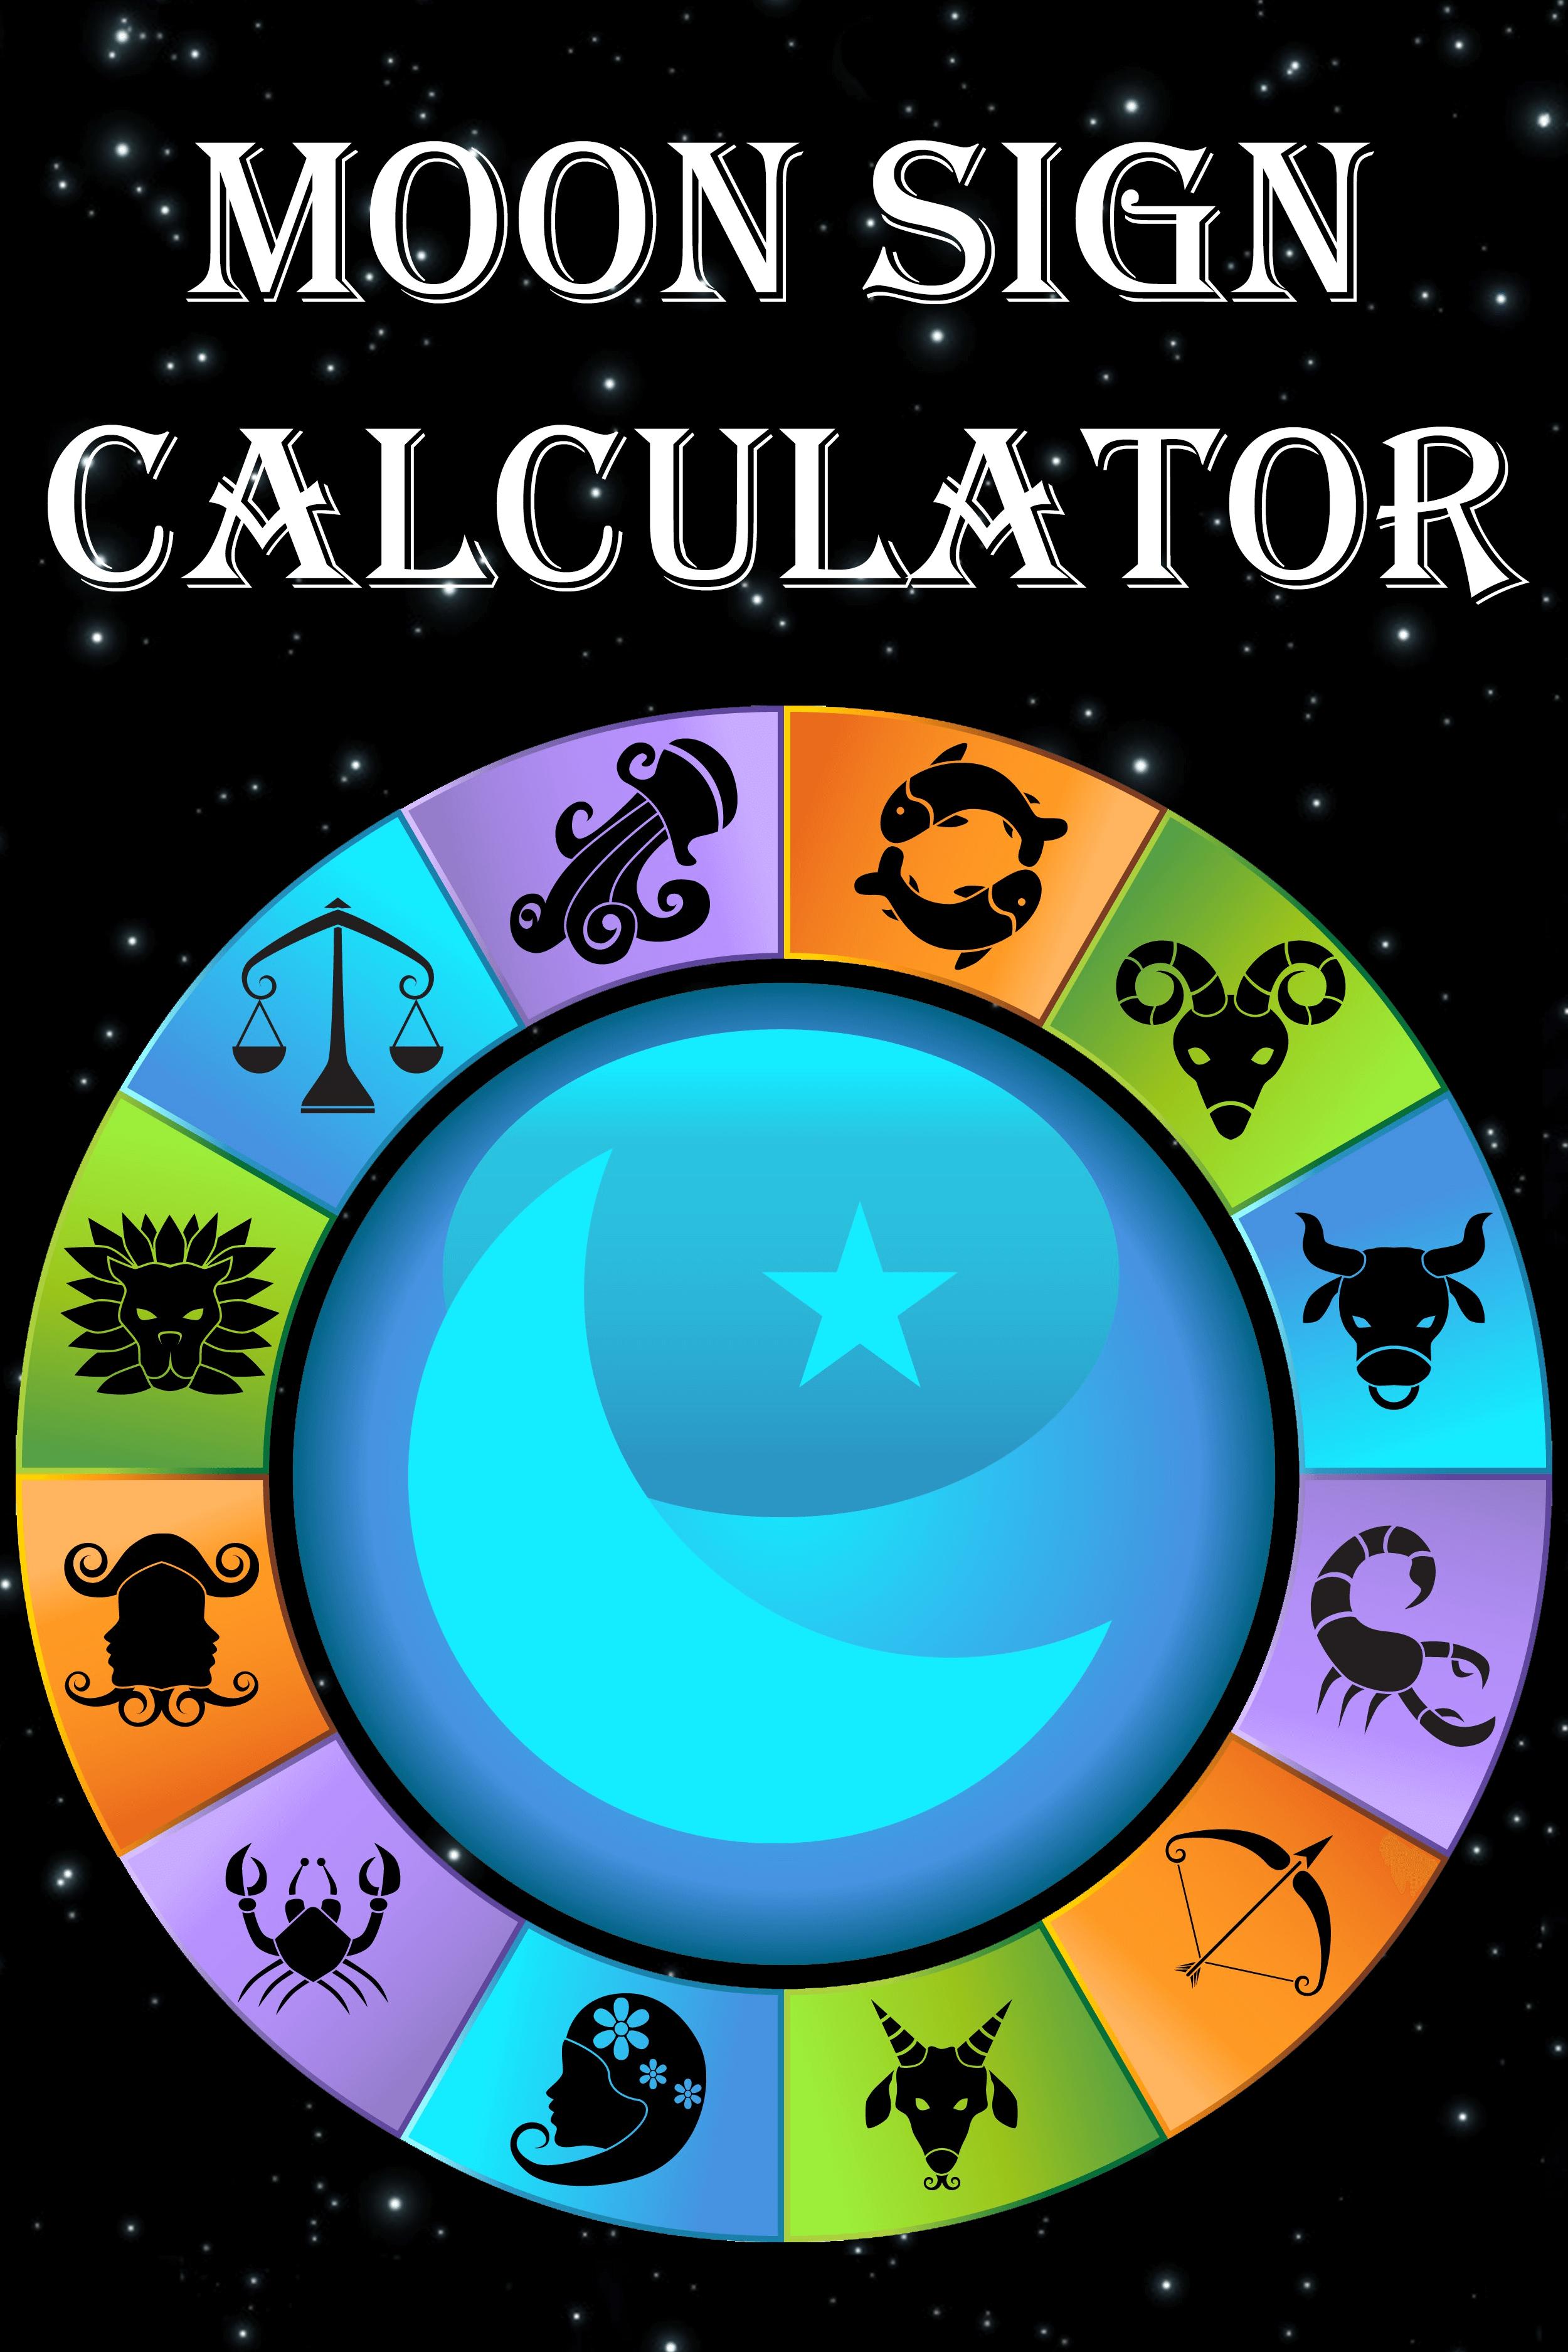 astrological moon signs calculator